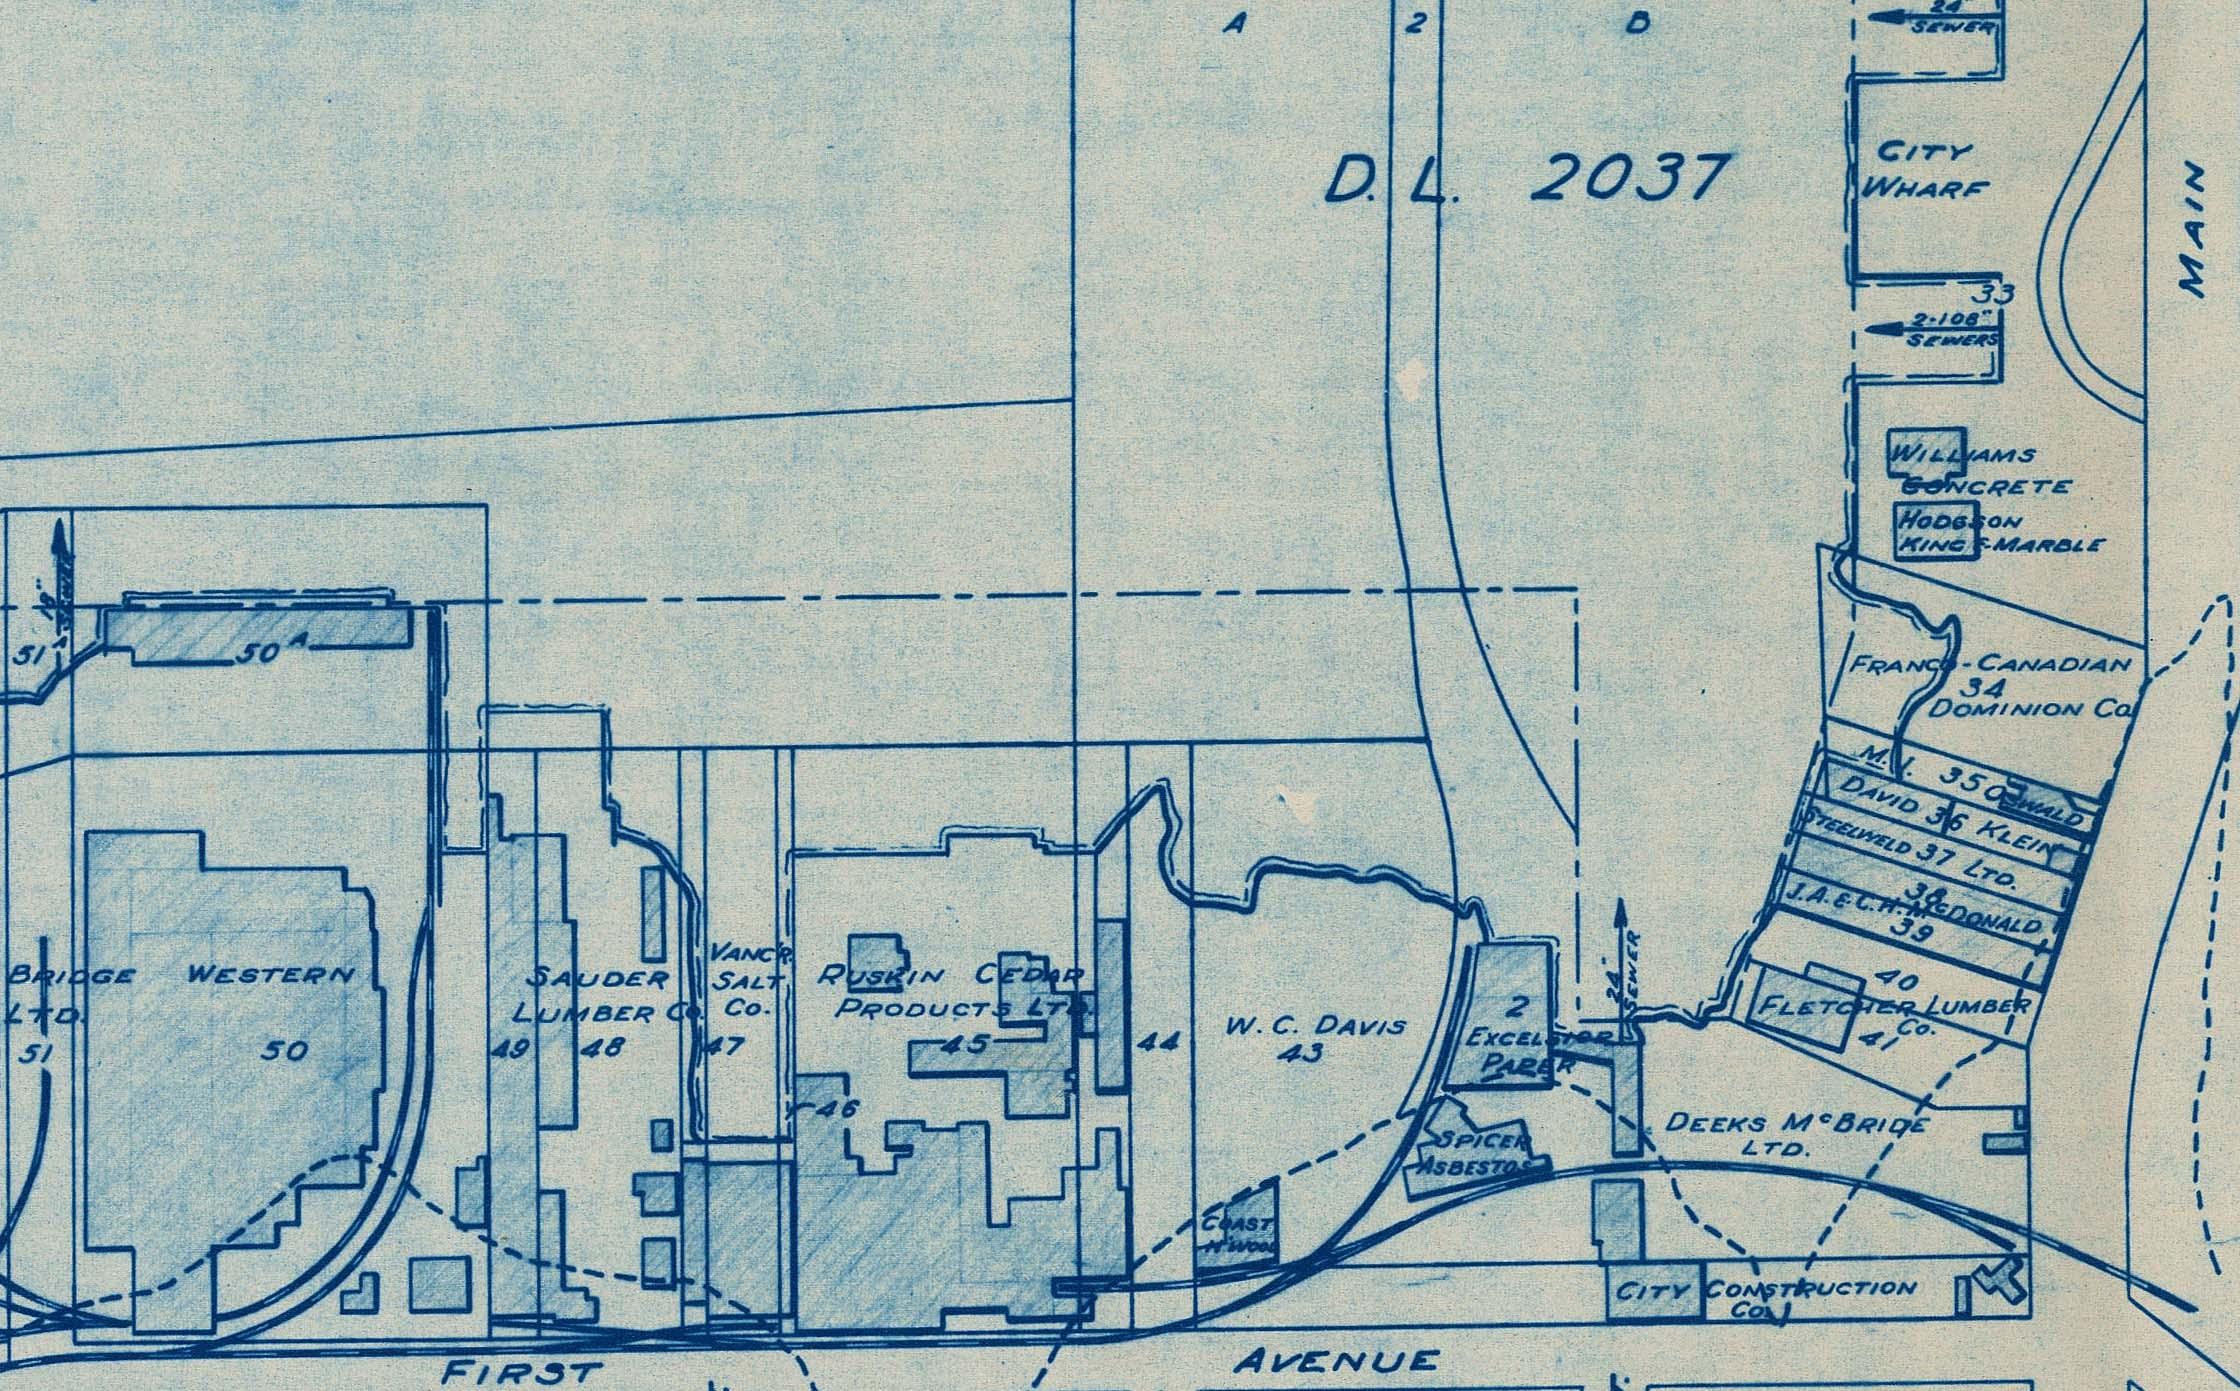 False Creek development survey occupation plan, September 1952. Reference code AM738-F1-: MAP 913.